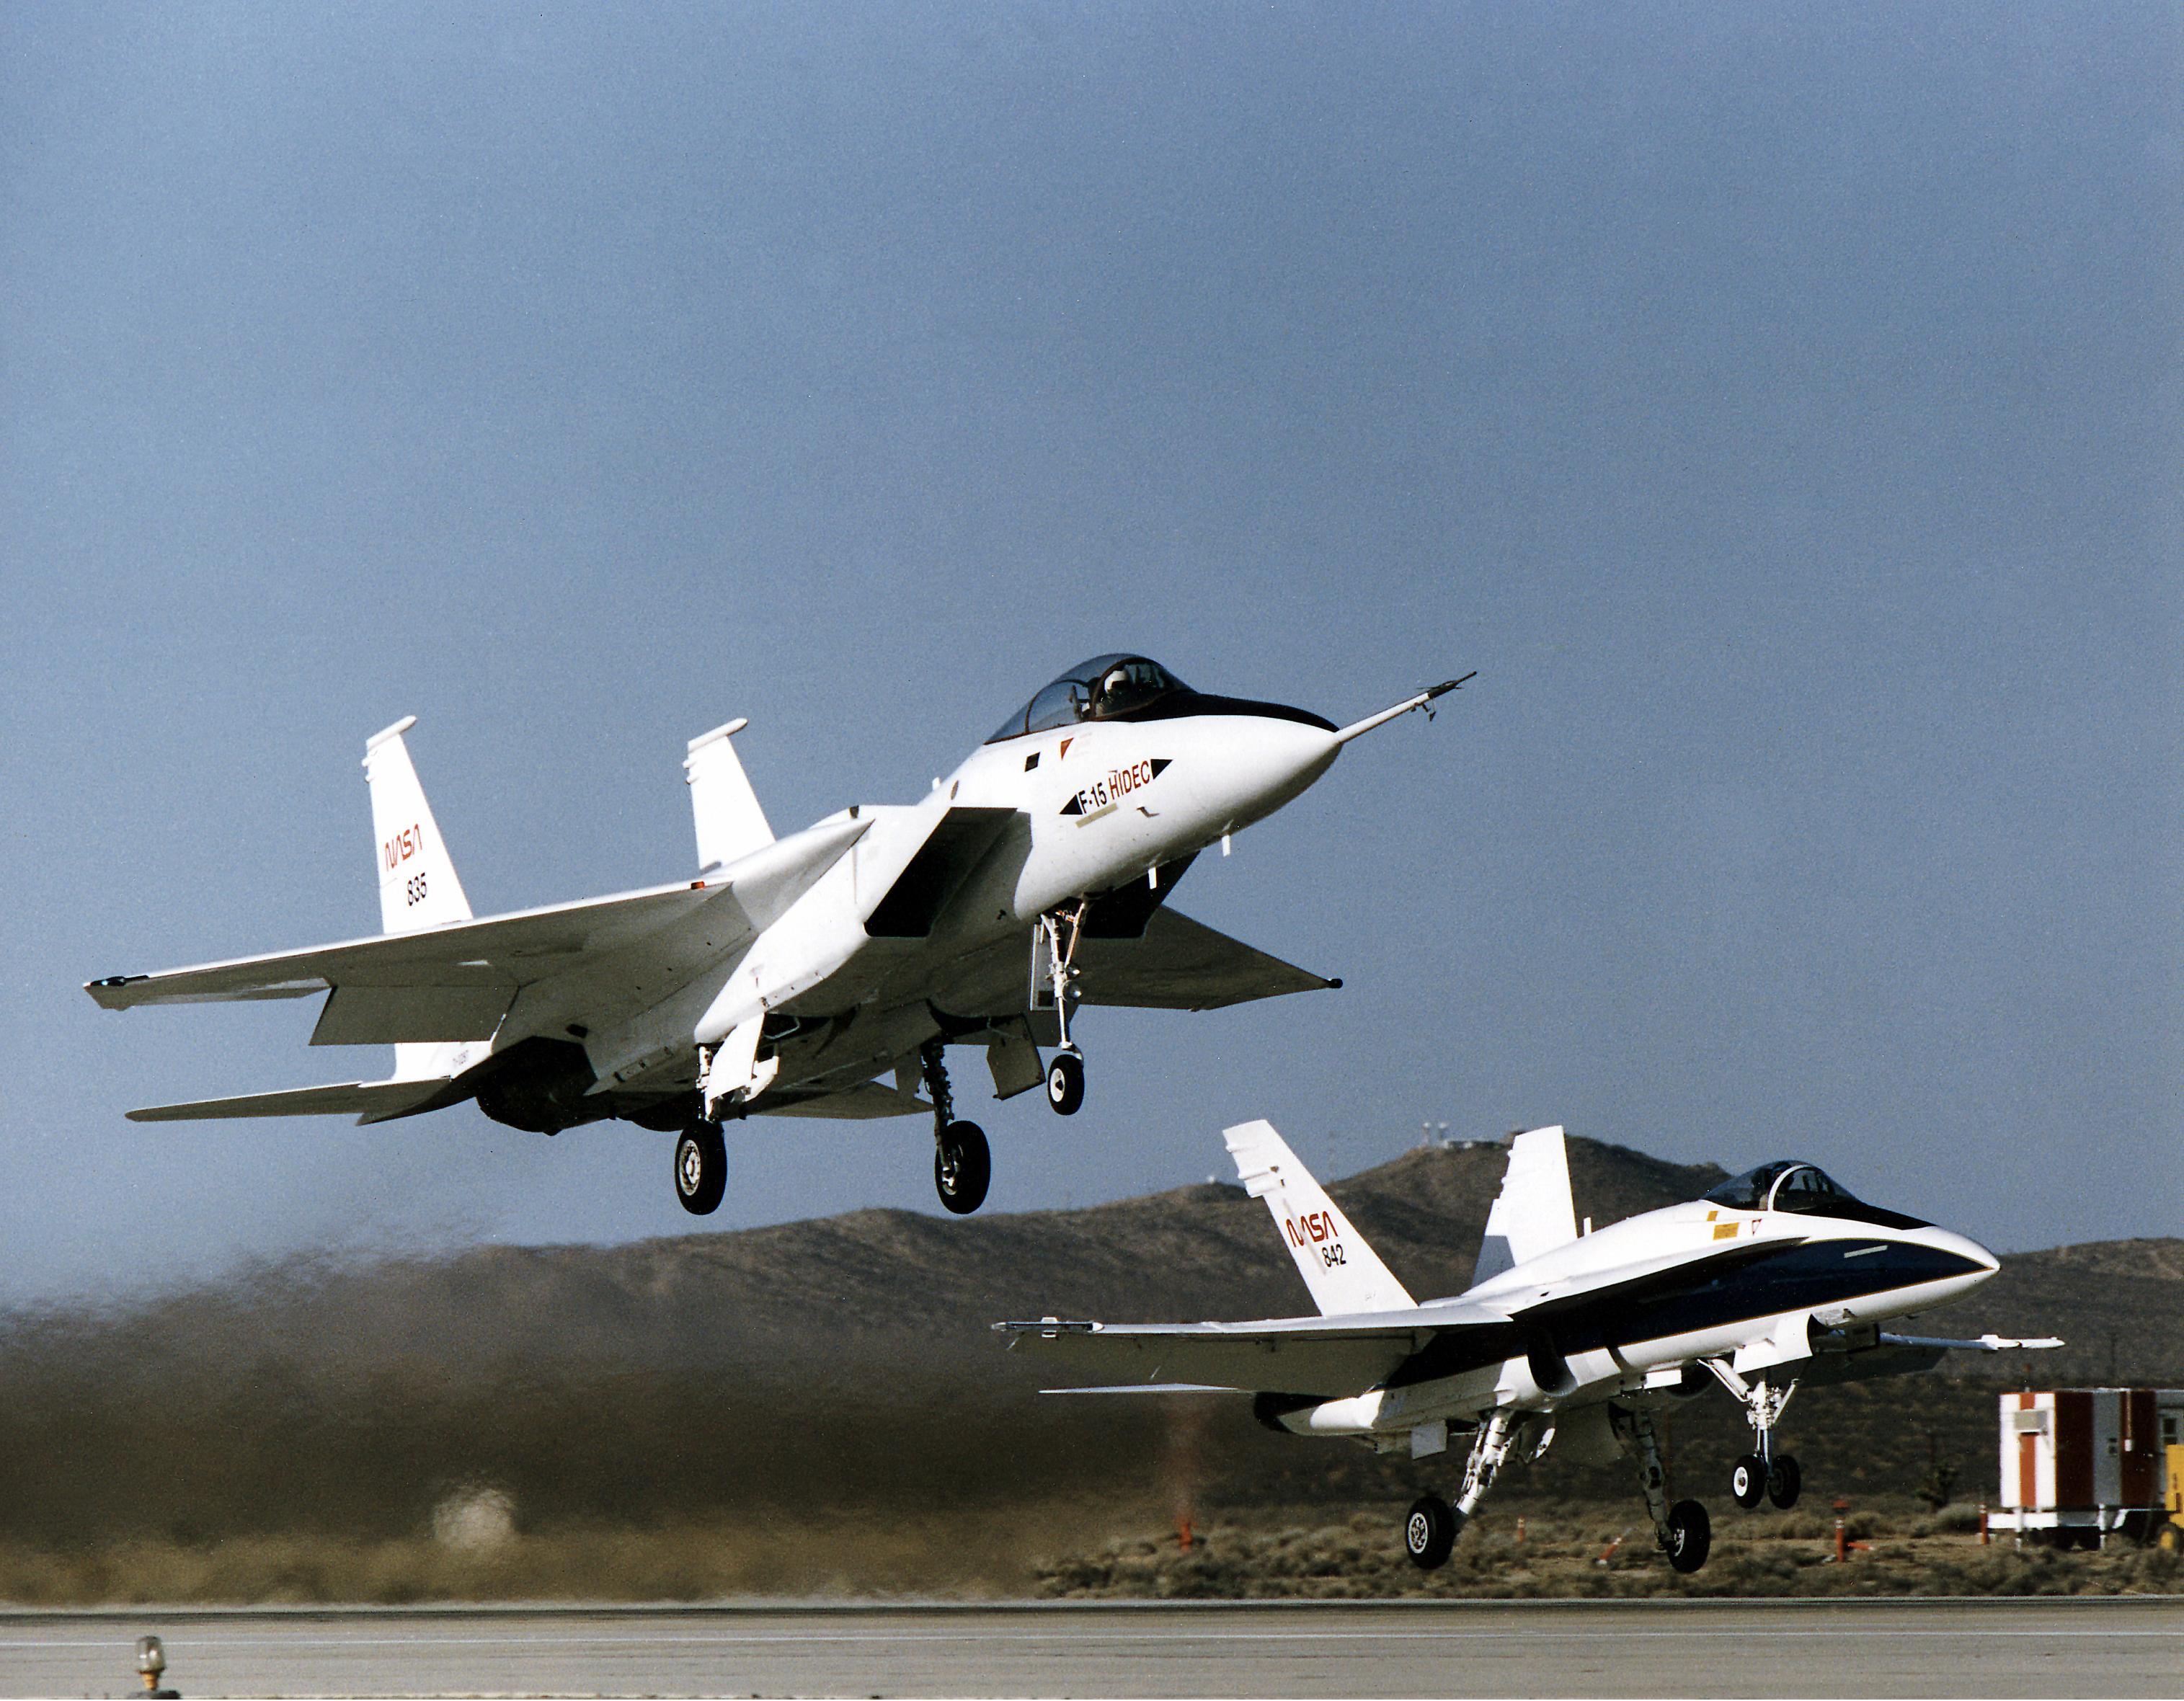 File:NASA HiDEC F-15A with F-18.jpg - Wikimedia Commons